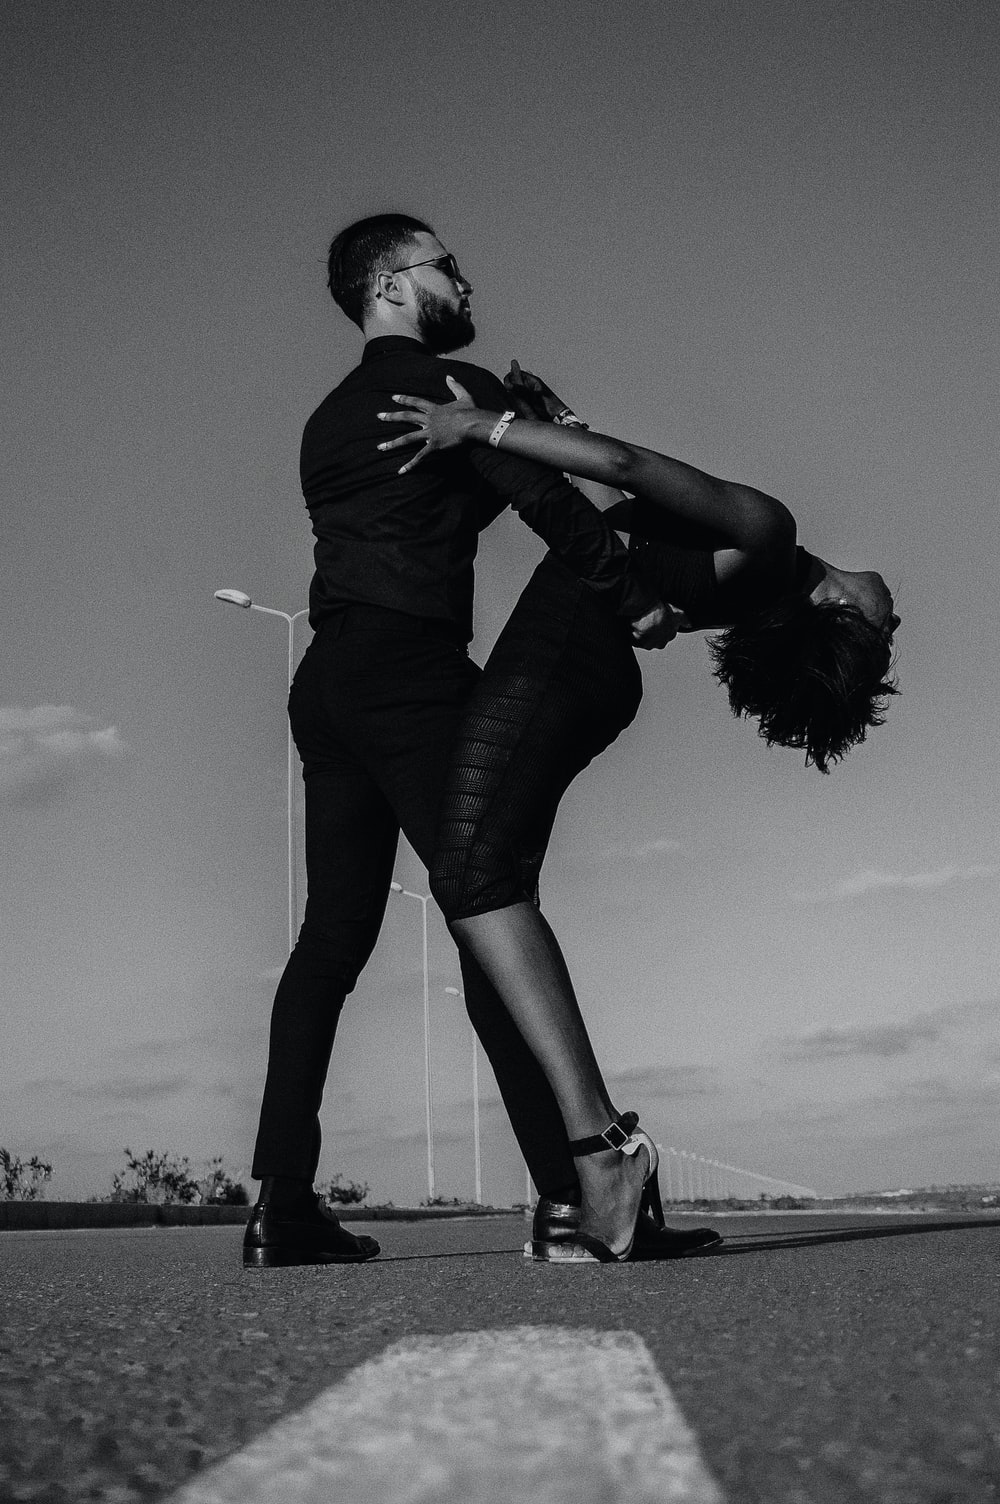 couple dance tango at the street